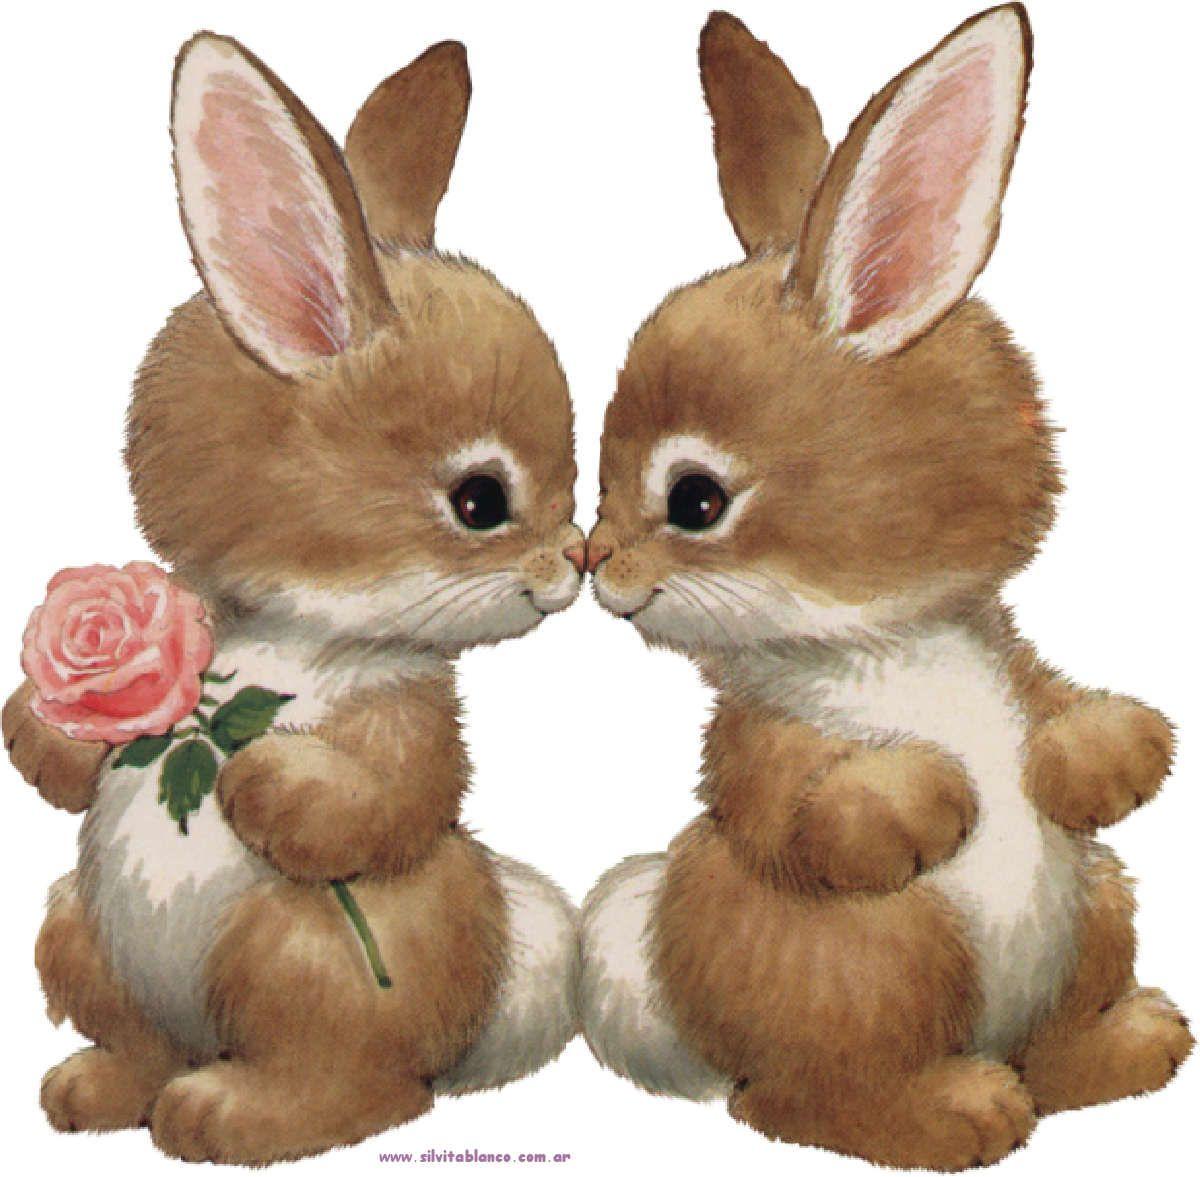 EASTER BUNNY CLIP ART | CLIP ART - EASTER - CLIPART ... Easter Clip Art Free Cute